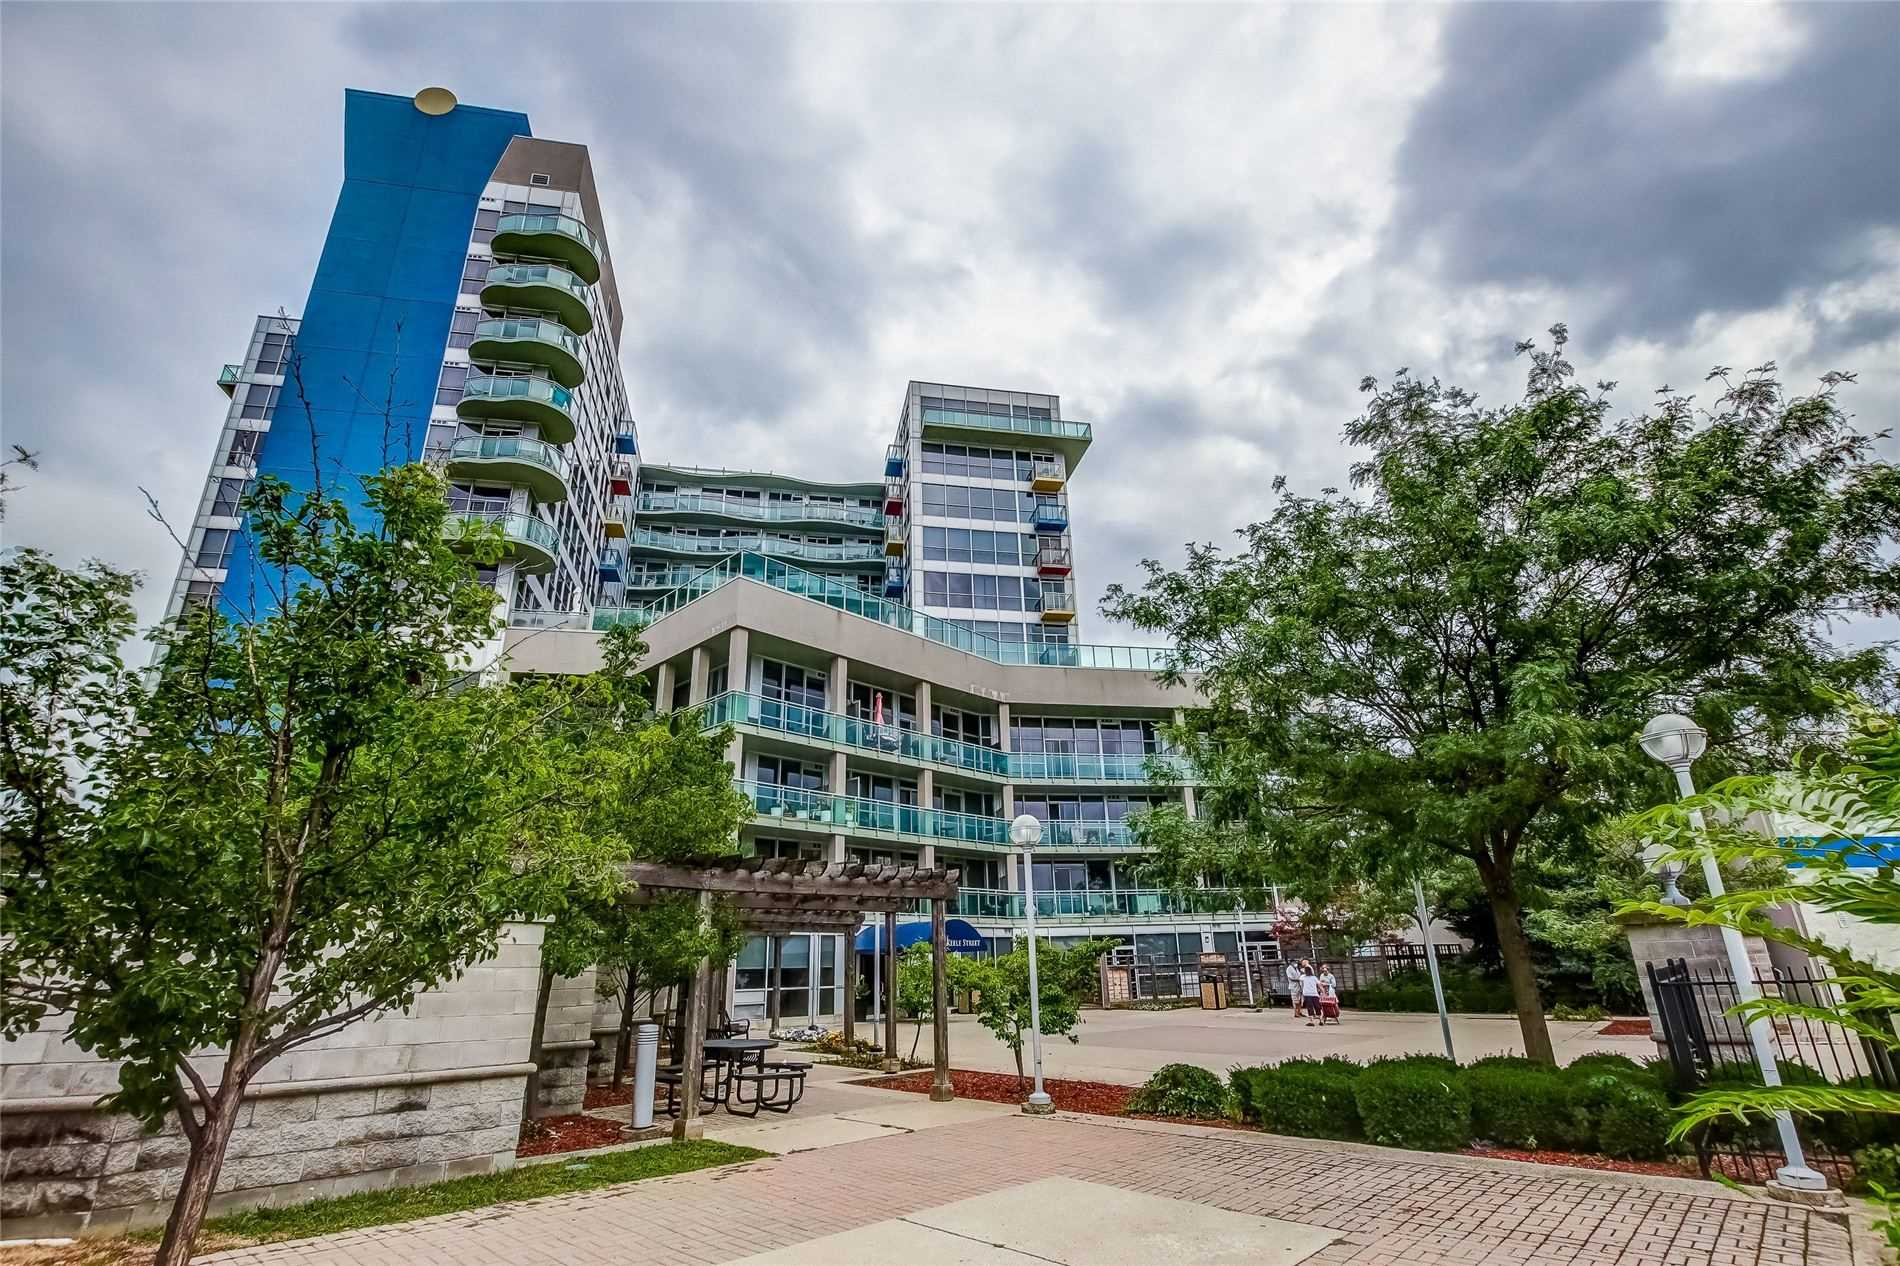 1600 Keele St, Toronto, Ontario M6N5J1, 1 Bedroom Bedrooms, 4 Rooms Rooms,1 BathroomBathrooms,Condo Apt,For Sale,Keele,W4896872